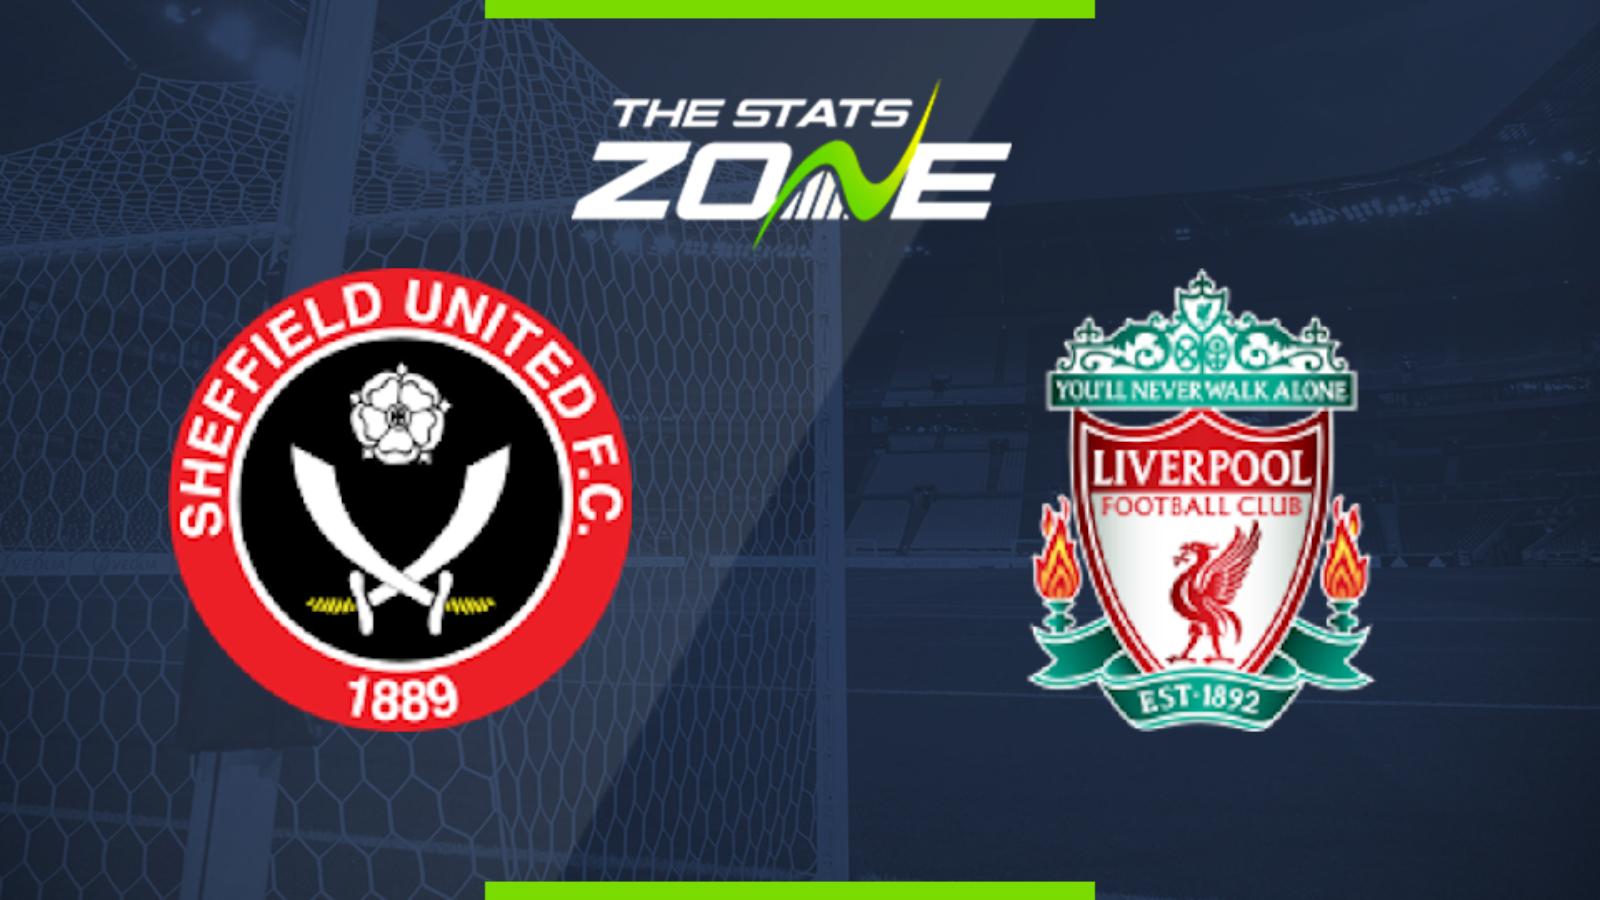 2019 20 Premier League Sheffield Utd Vs Liverpool Preview Prediction The Stats Zone